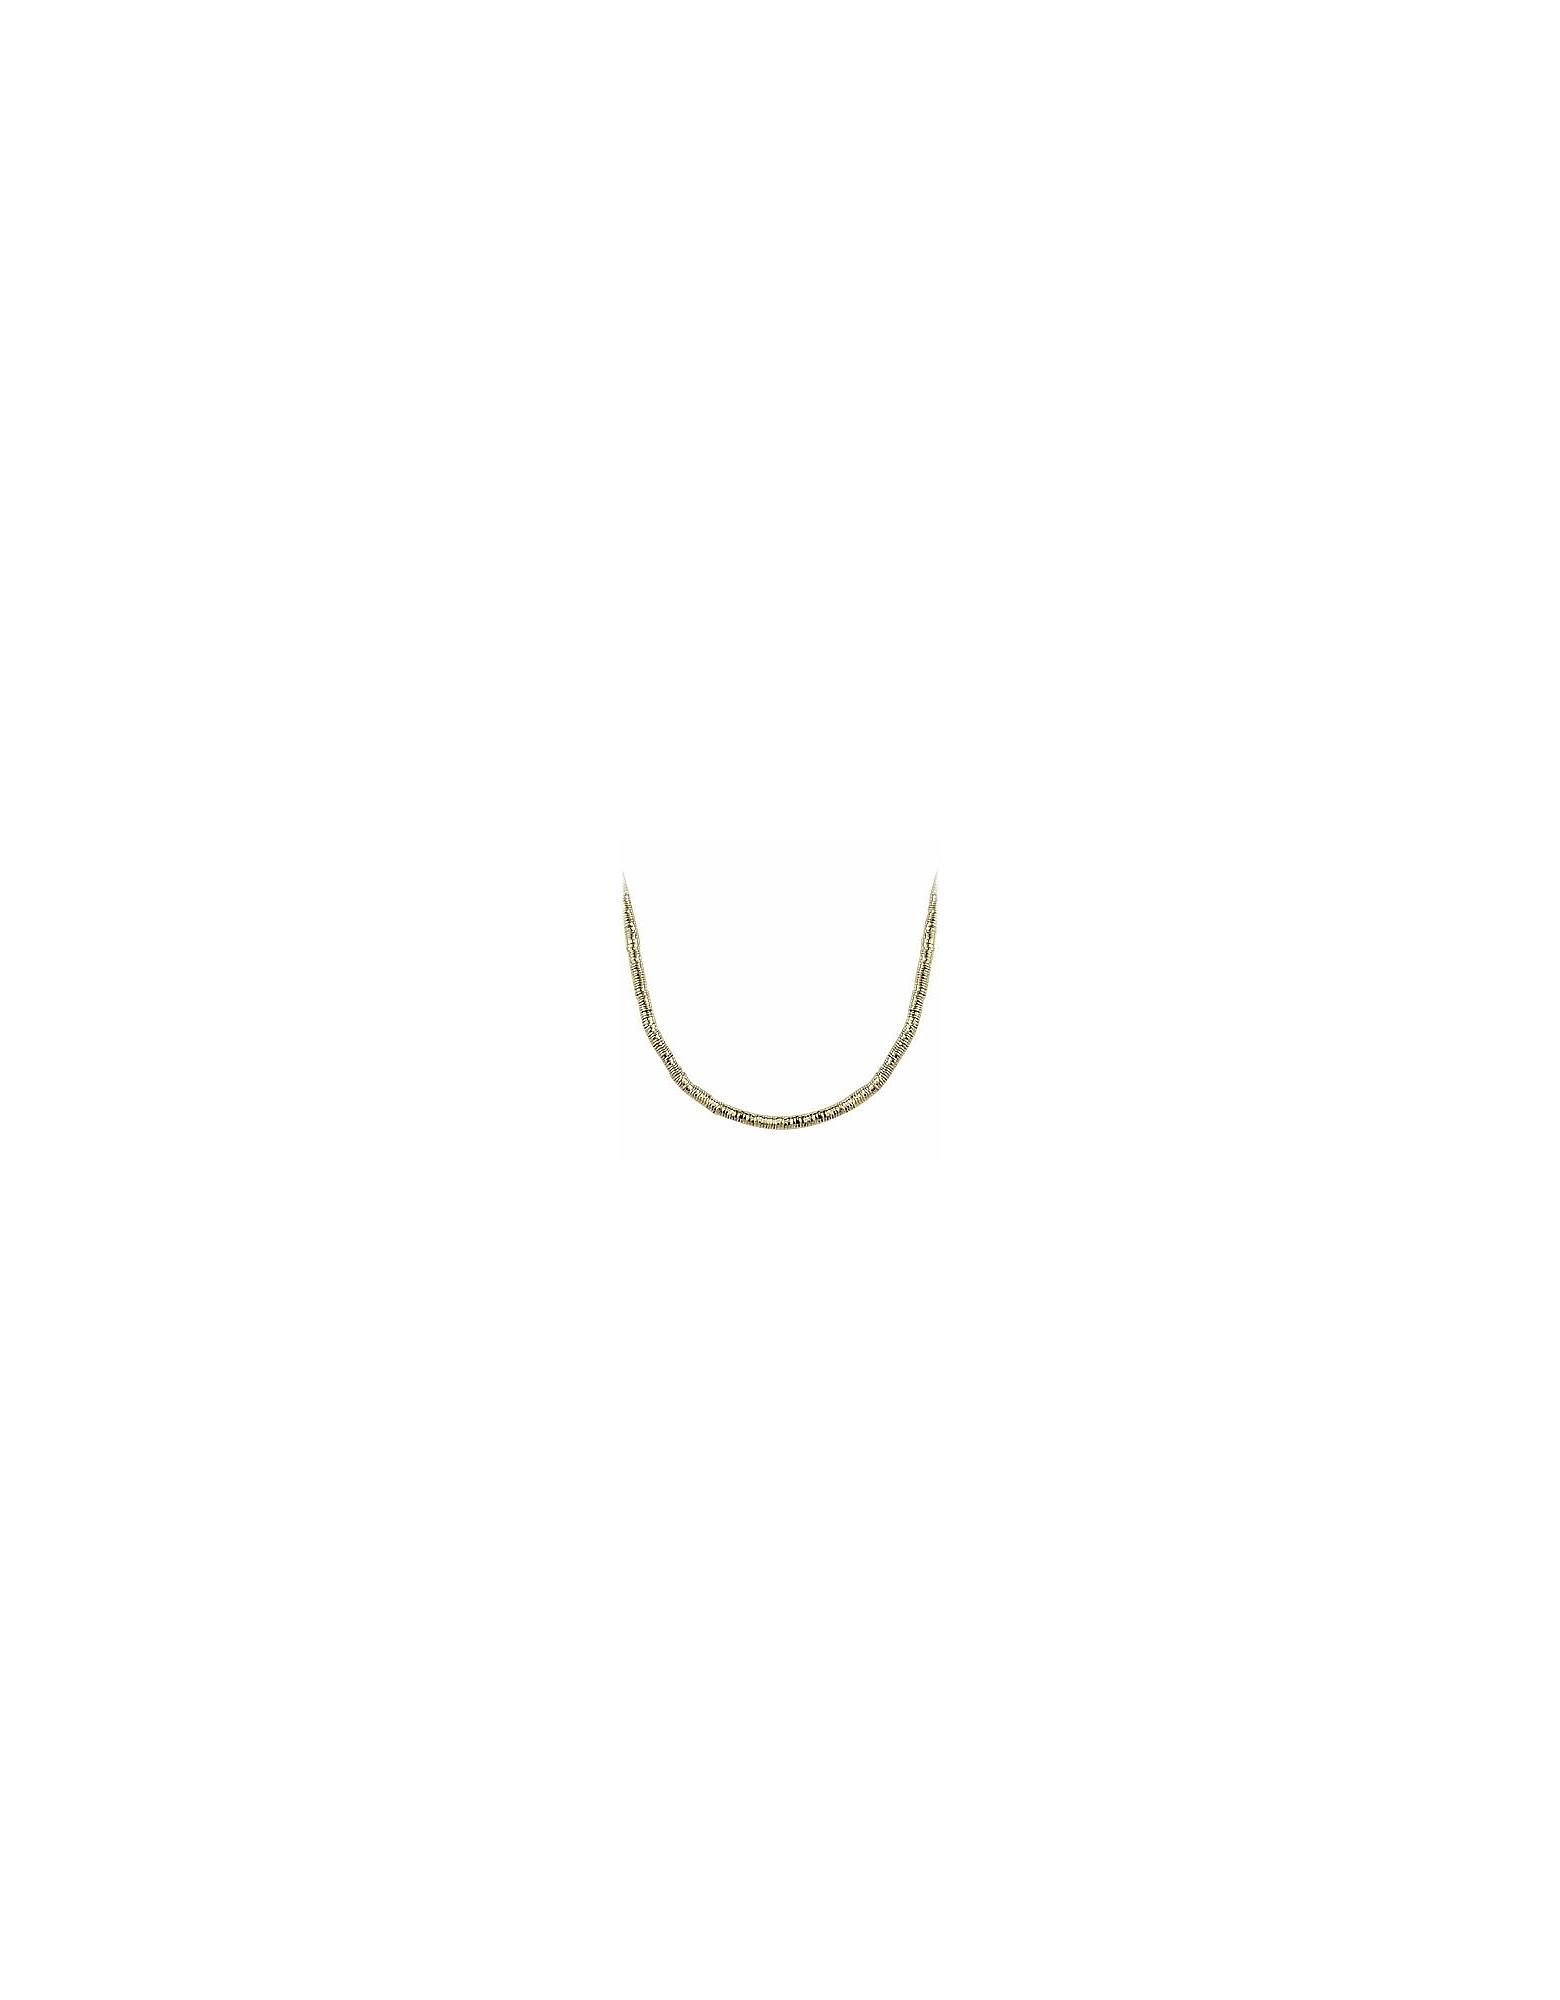 Orlando Orlandini Men's Necklaces, Gold Plate Rubber Necklace